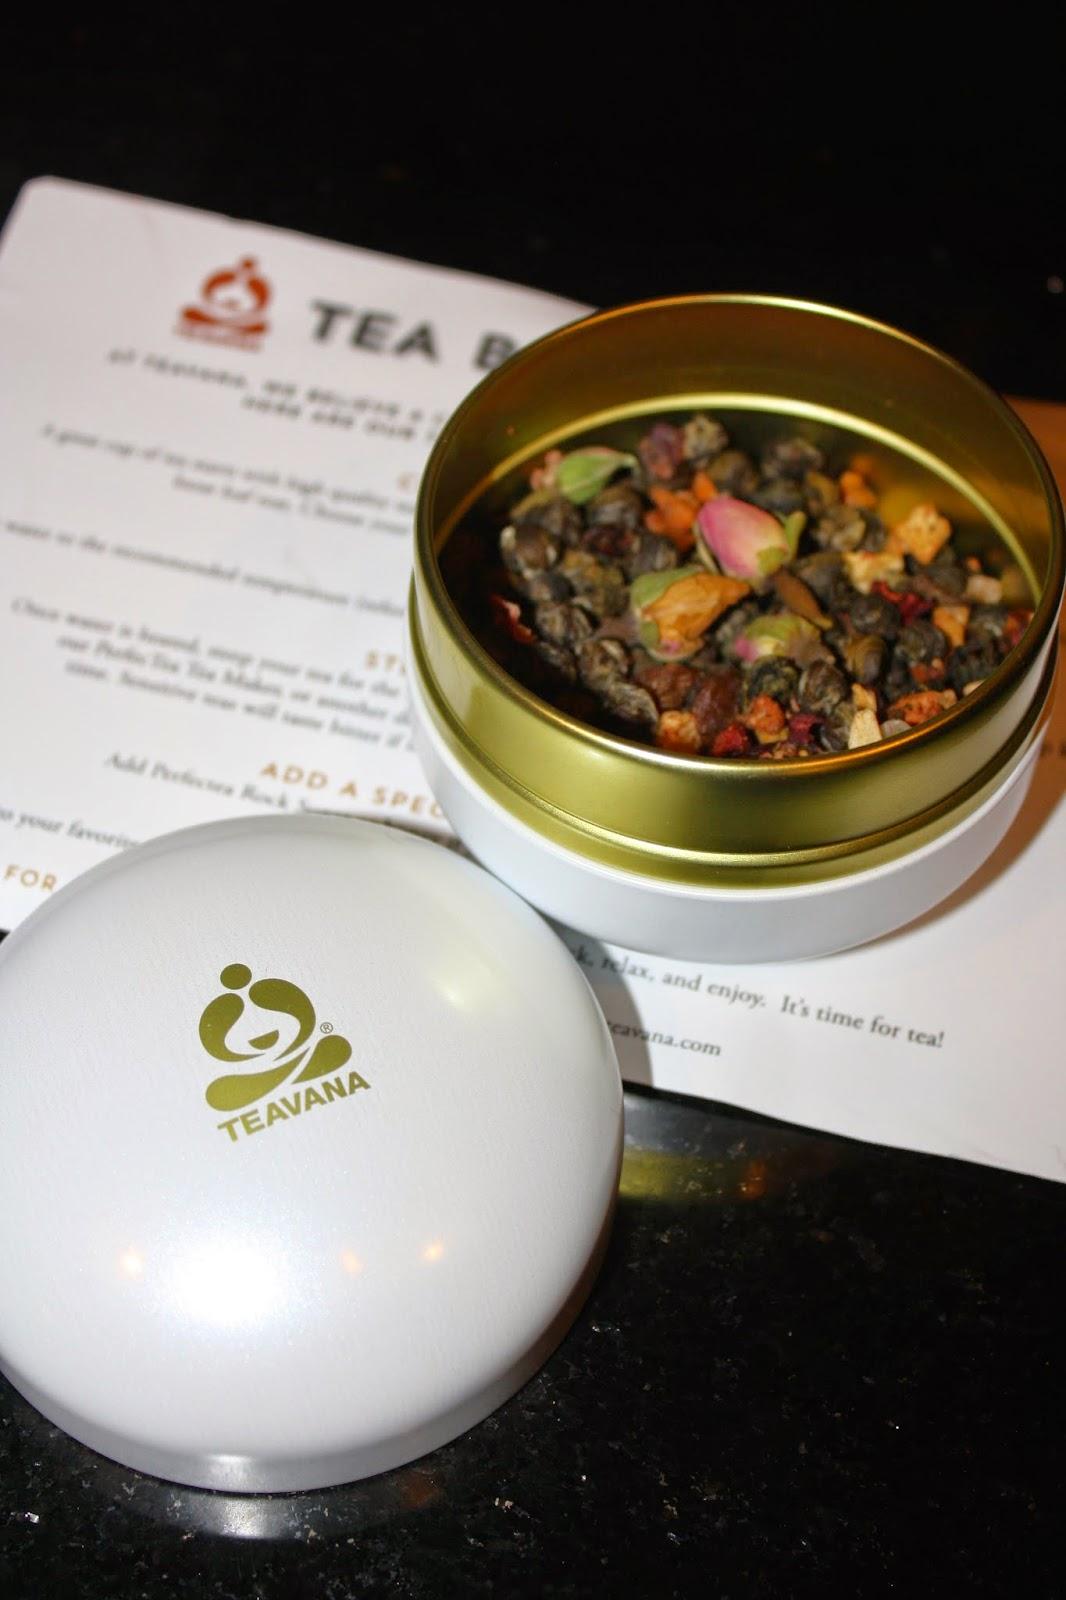 teavana perfect tea maker instructions